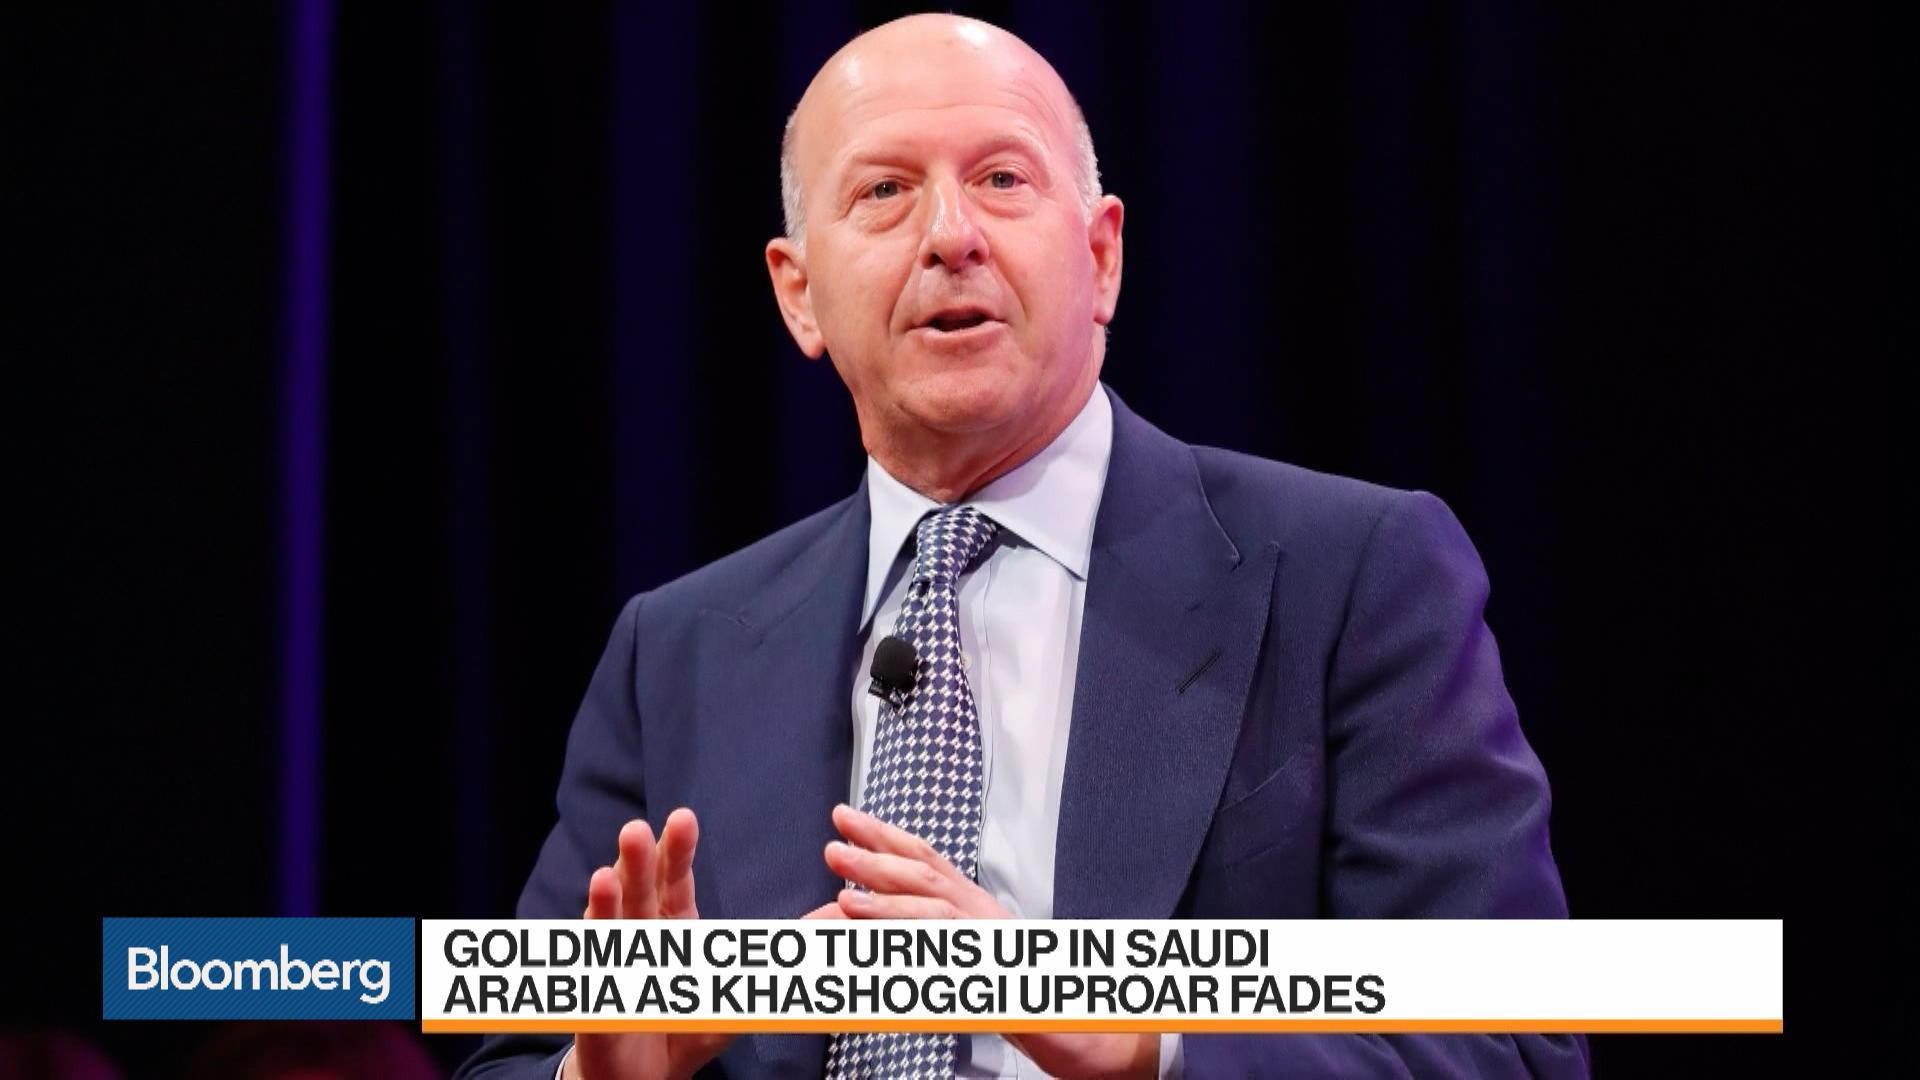 Goldman CEO Turns Up in Saudi Arabia as Khashoggi Uproar Fades